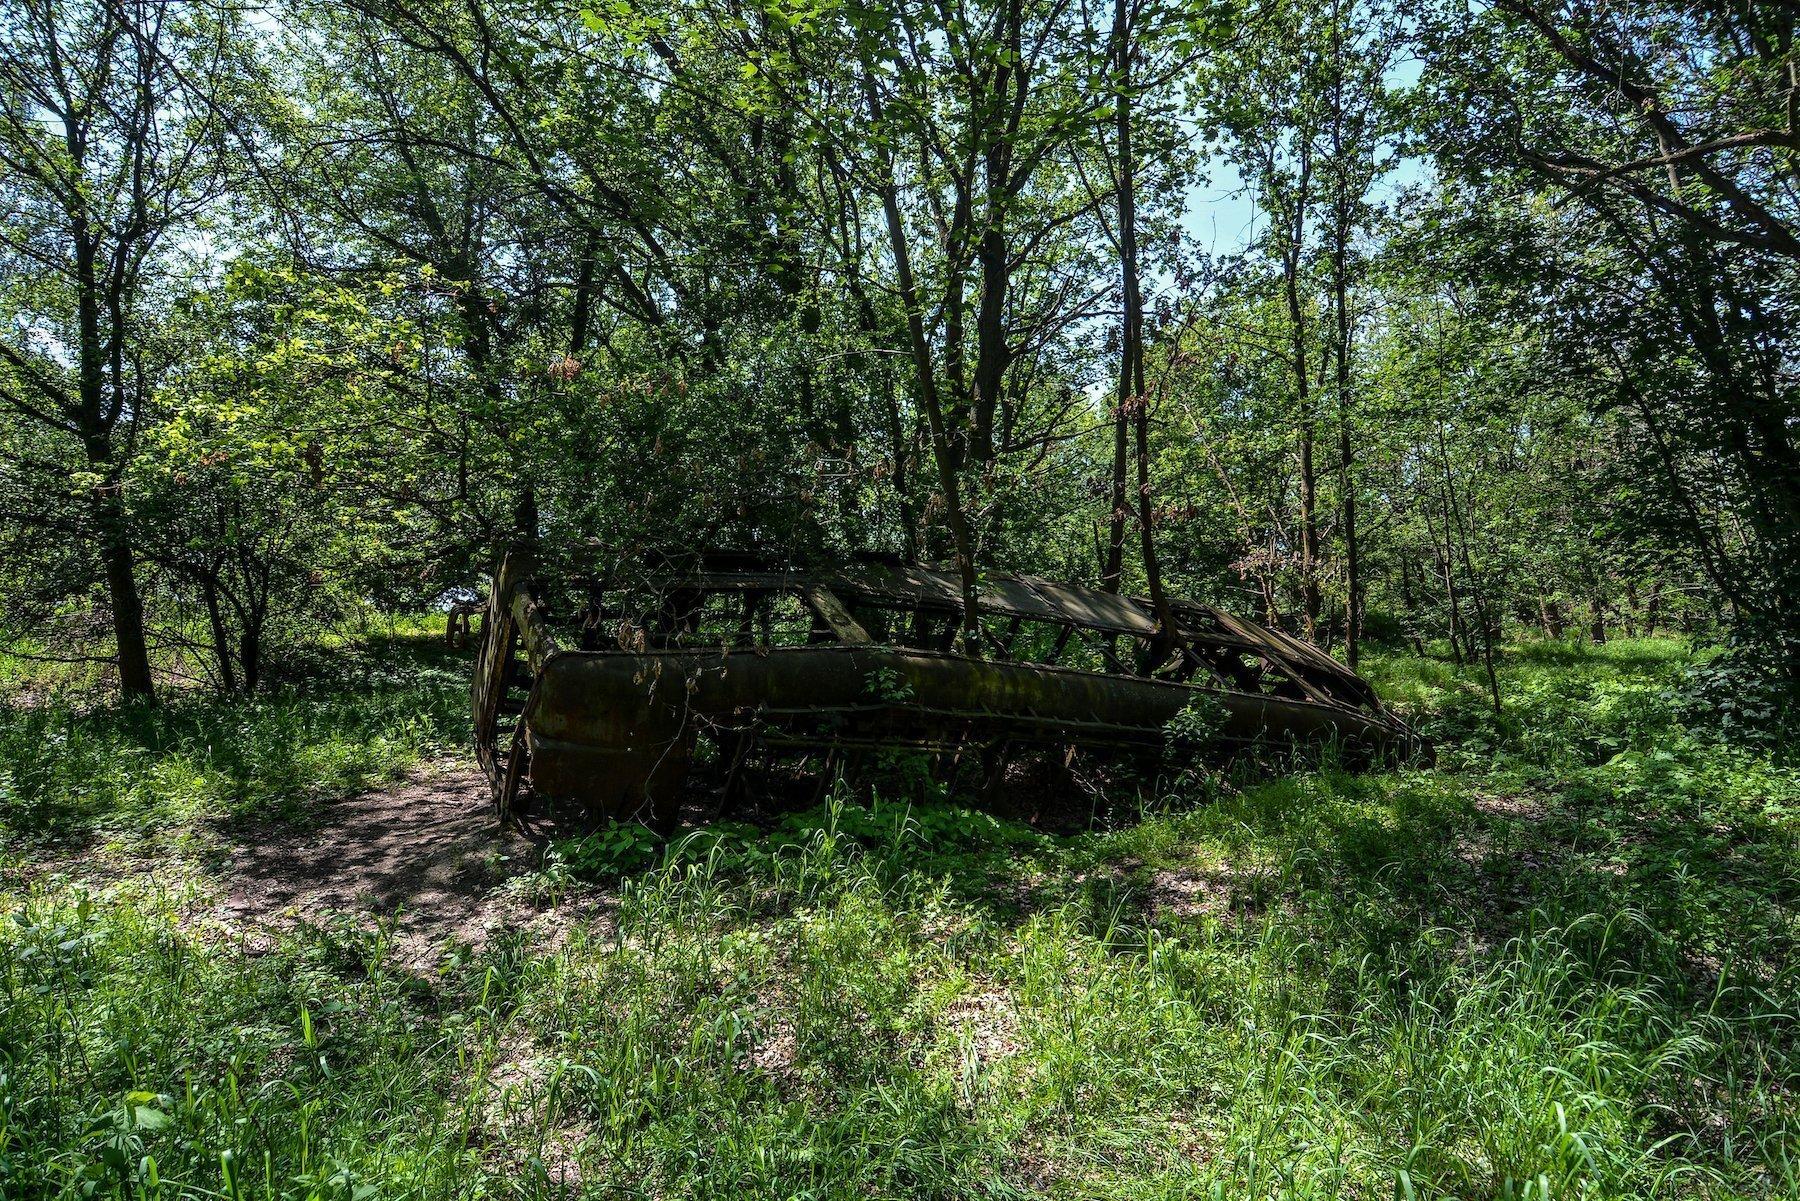 tram skeleton strassenbahn brandenburg dallgow doeberitz potsdam abandoned urbex lost places germany deutschland